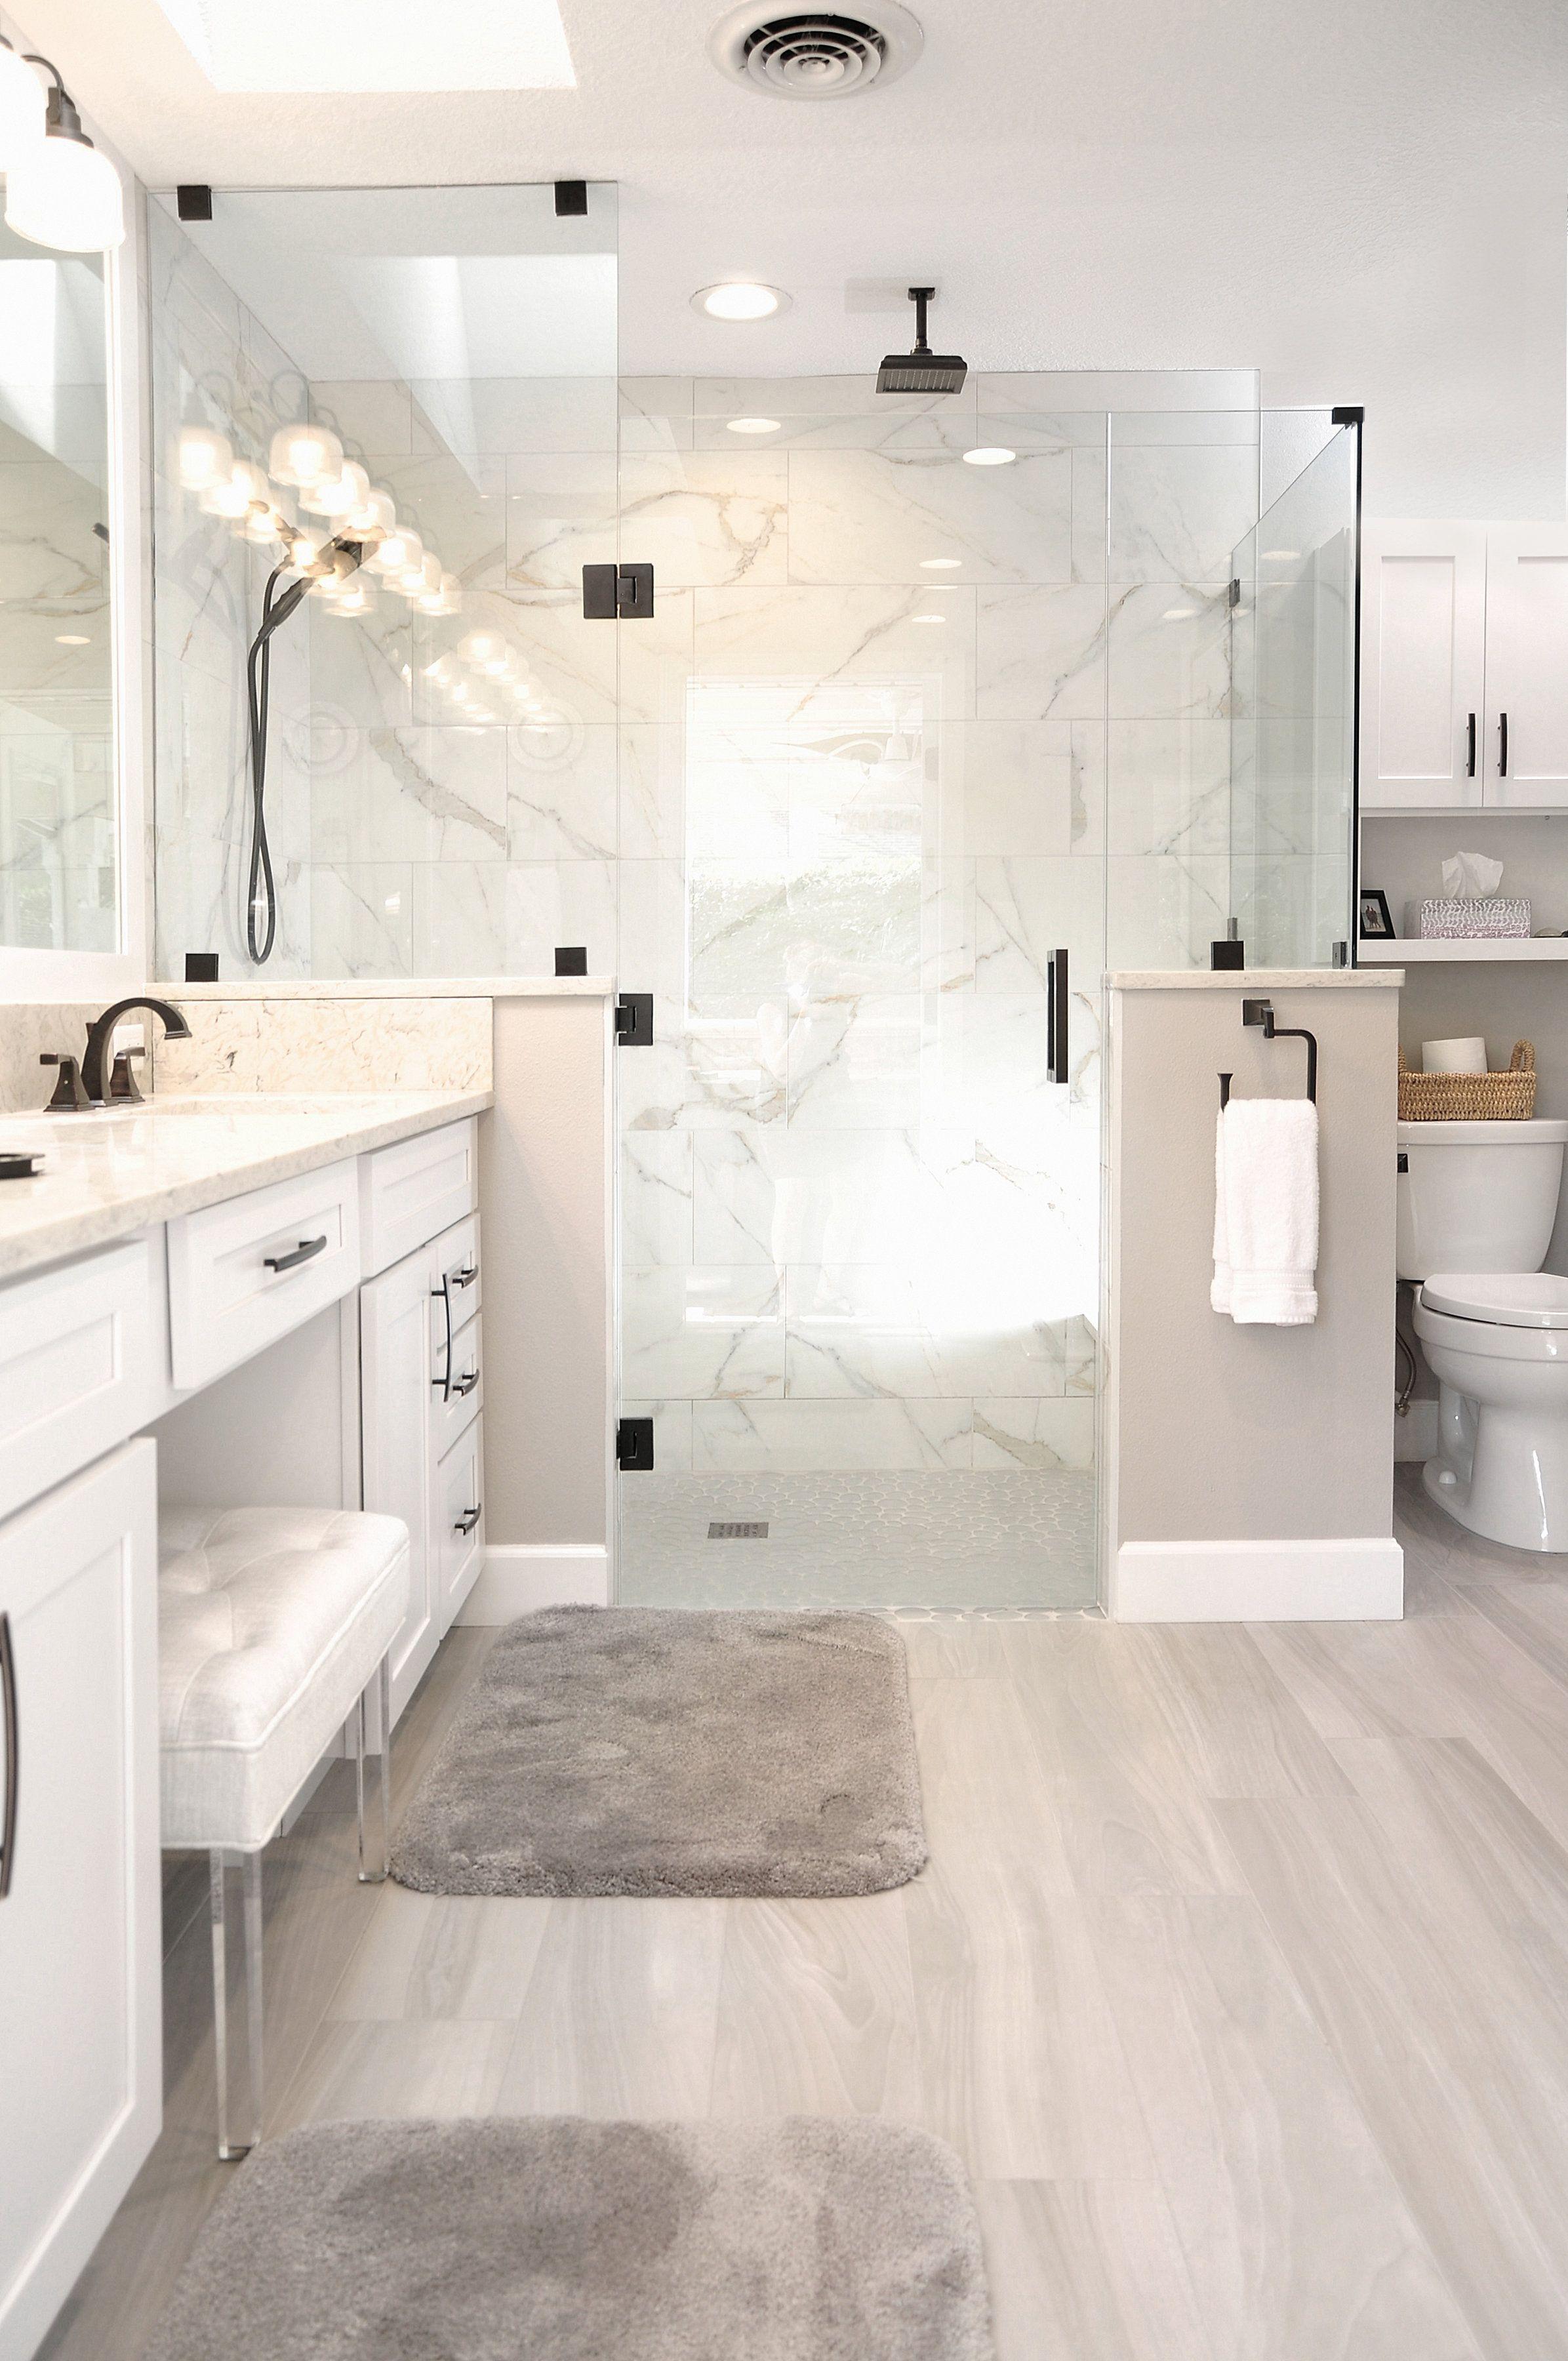 Bright Neutral Bathroom Remodel Bathroom Design Small Bathrooms Remodel Bathroom Color Schemes